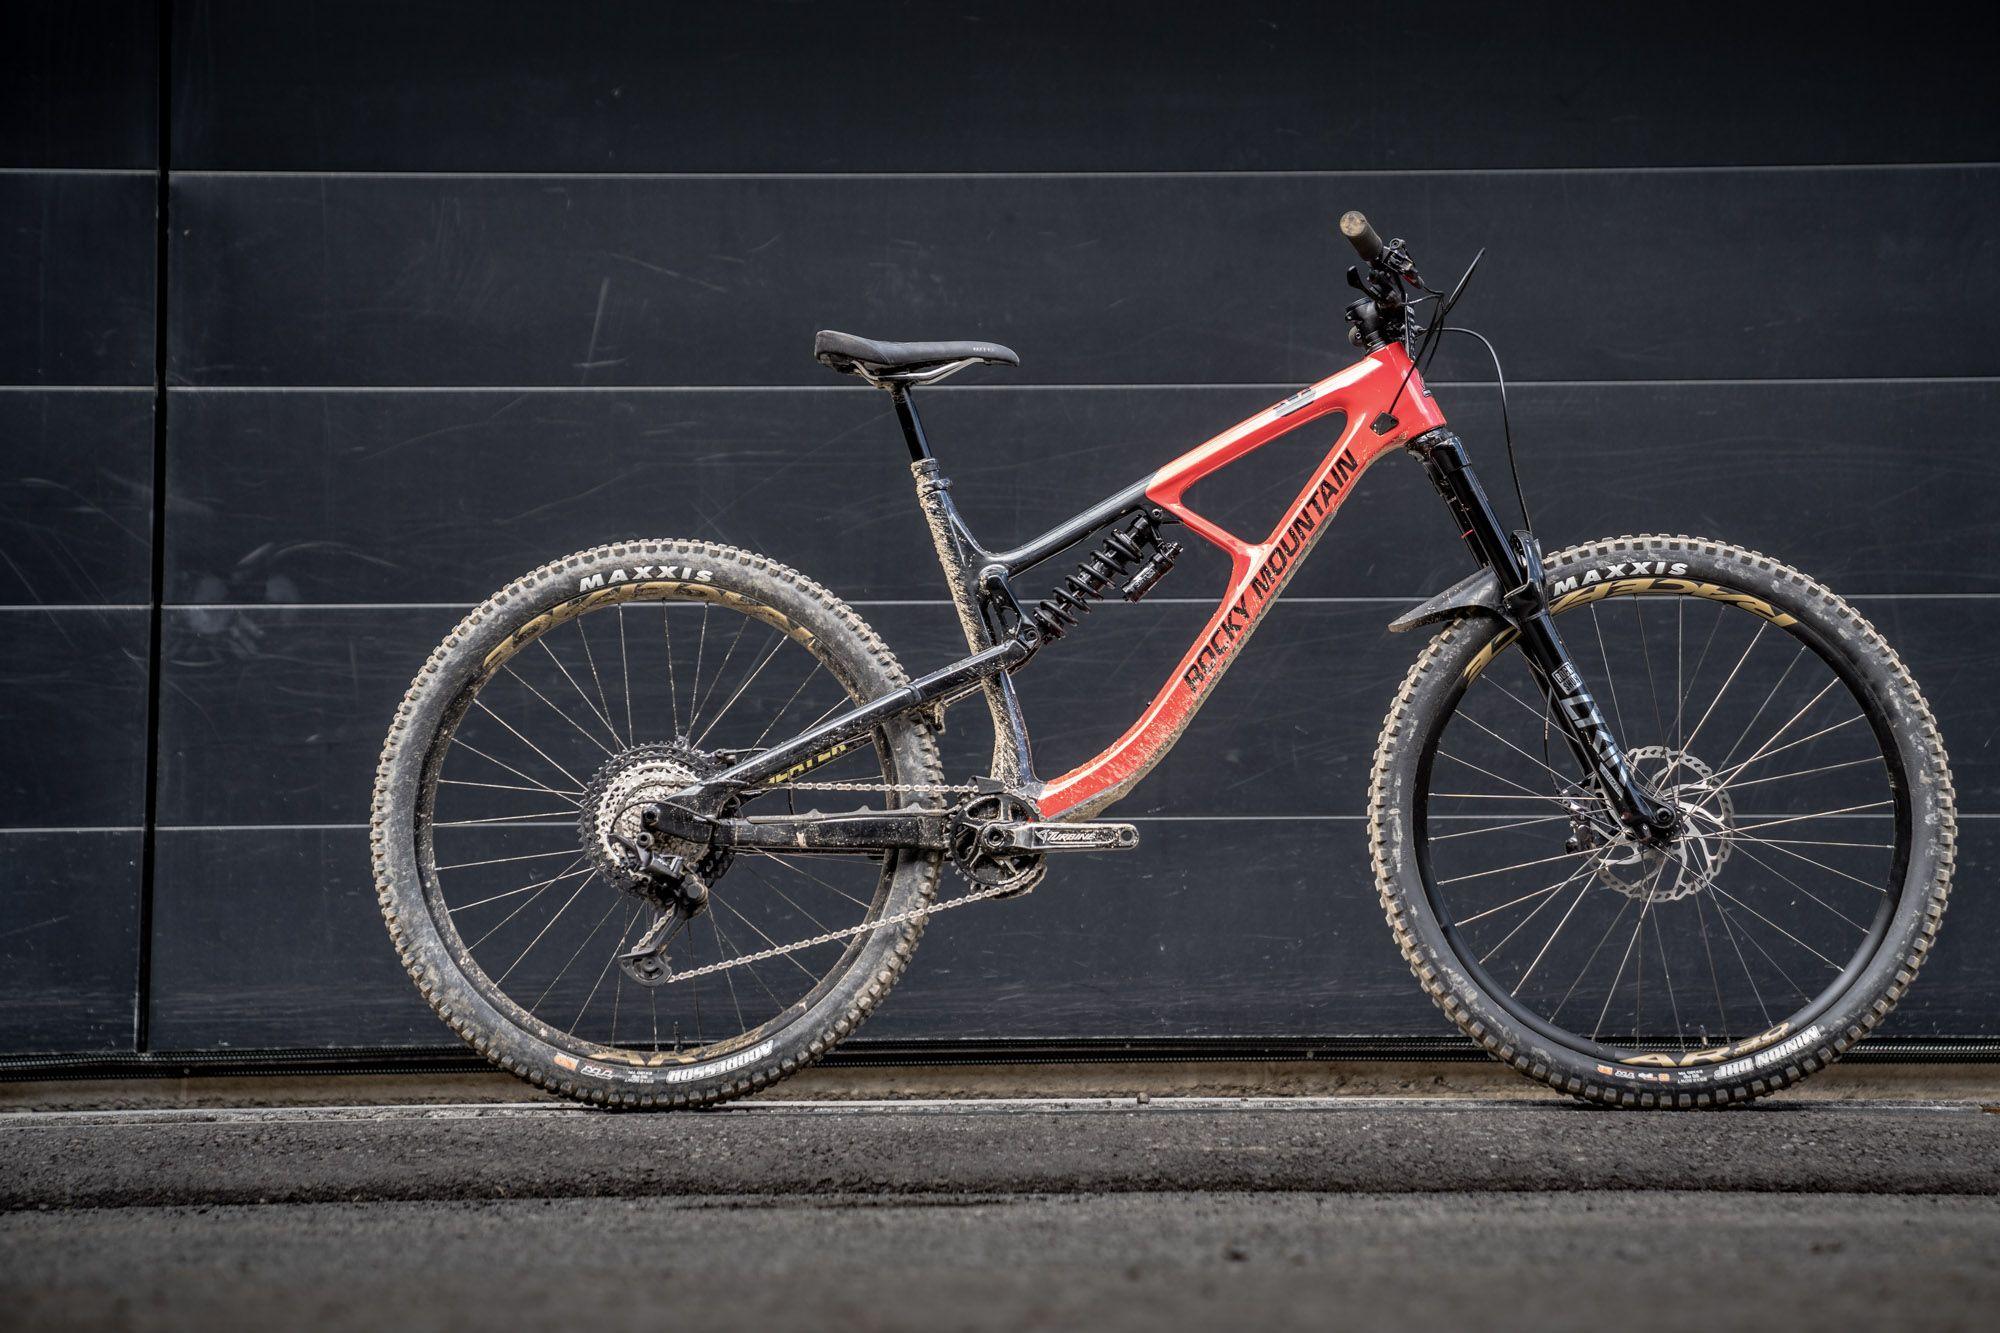 Rocky Mountain Slayer 2020 Im Ersten Test Canadian Huck Wagon Mtb News De Downhill Bike Fahrrad Mtb Rocky